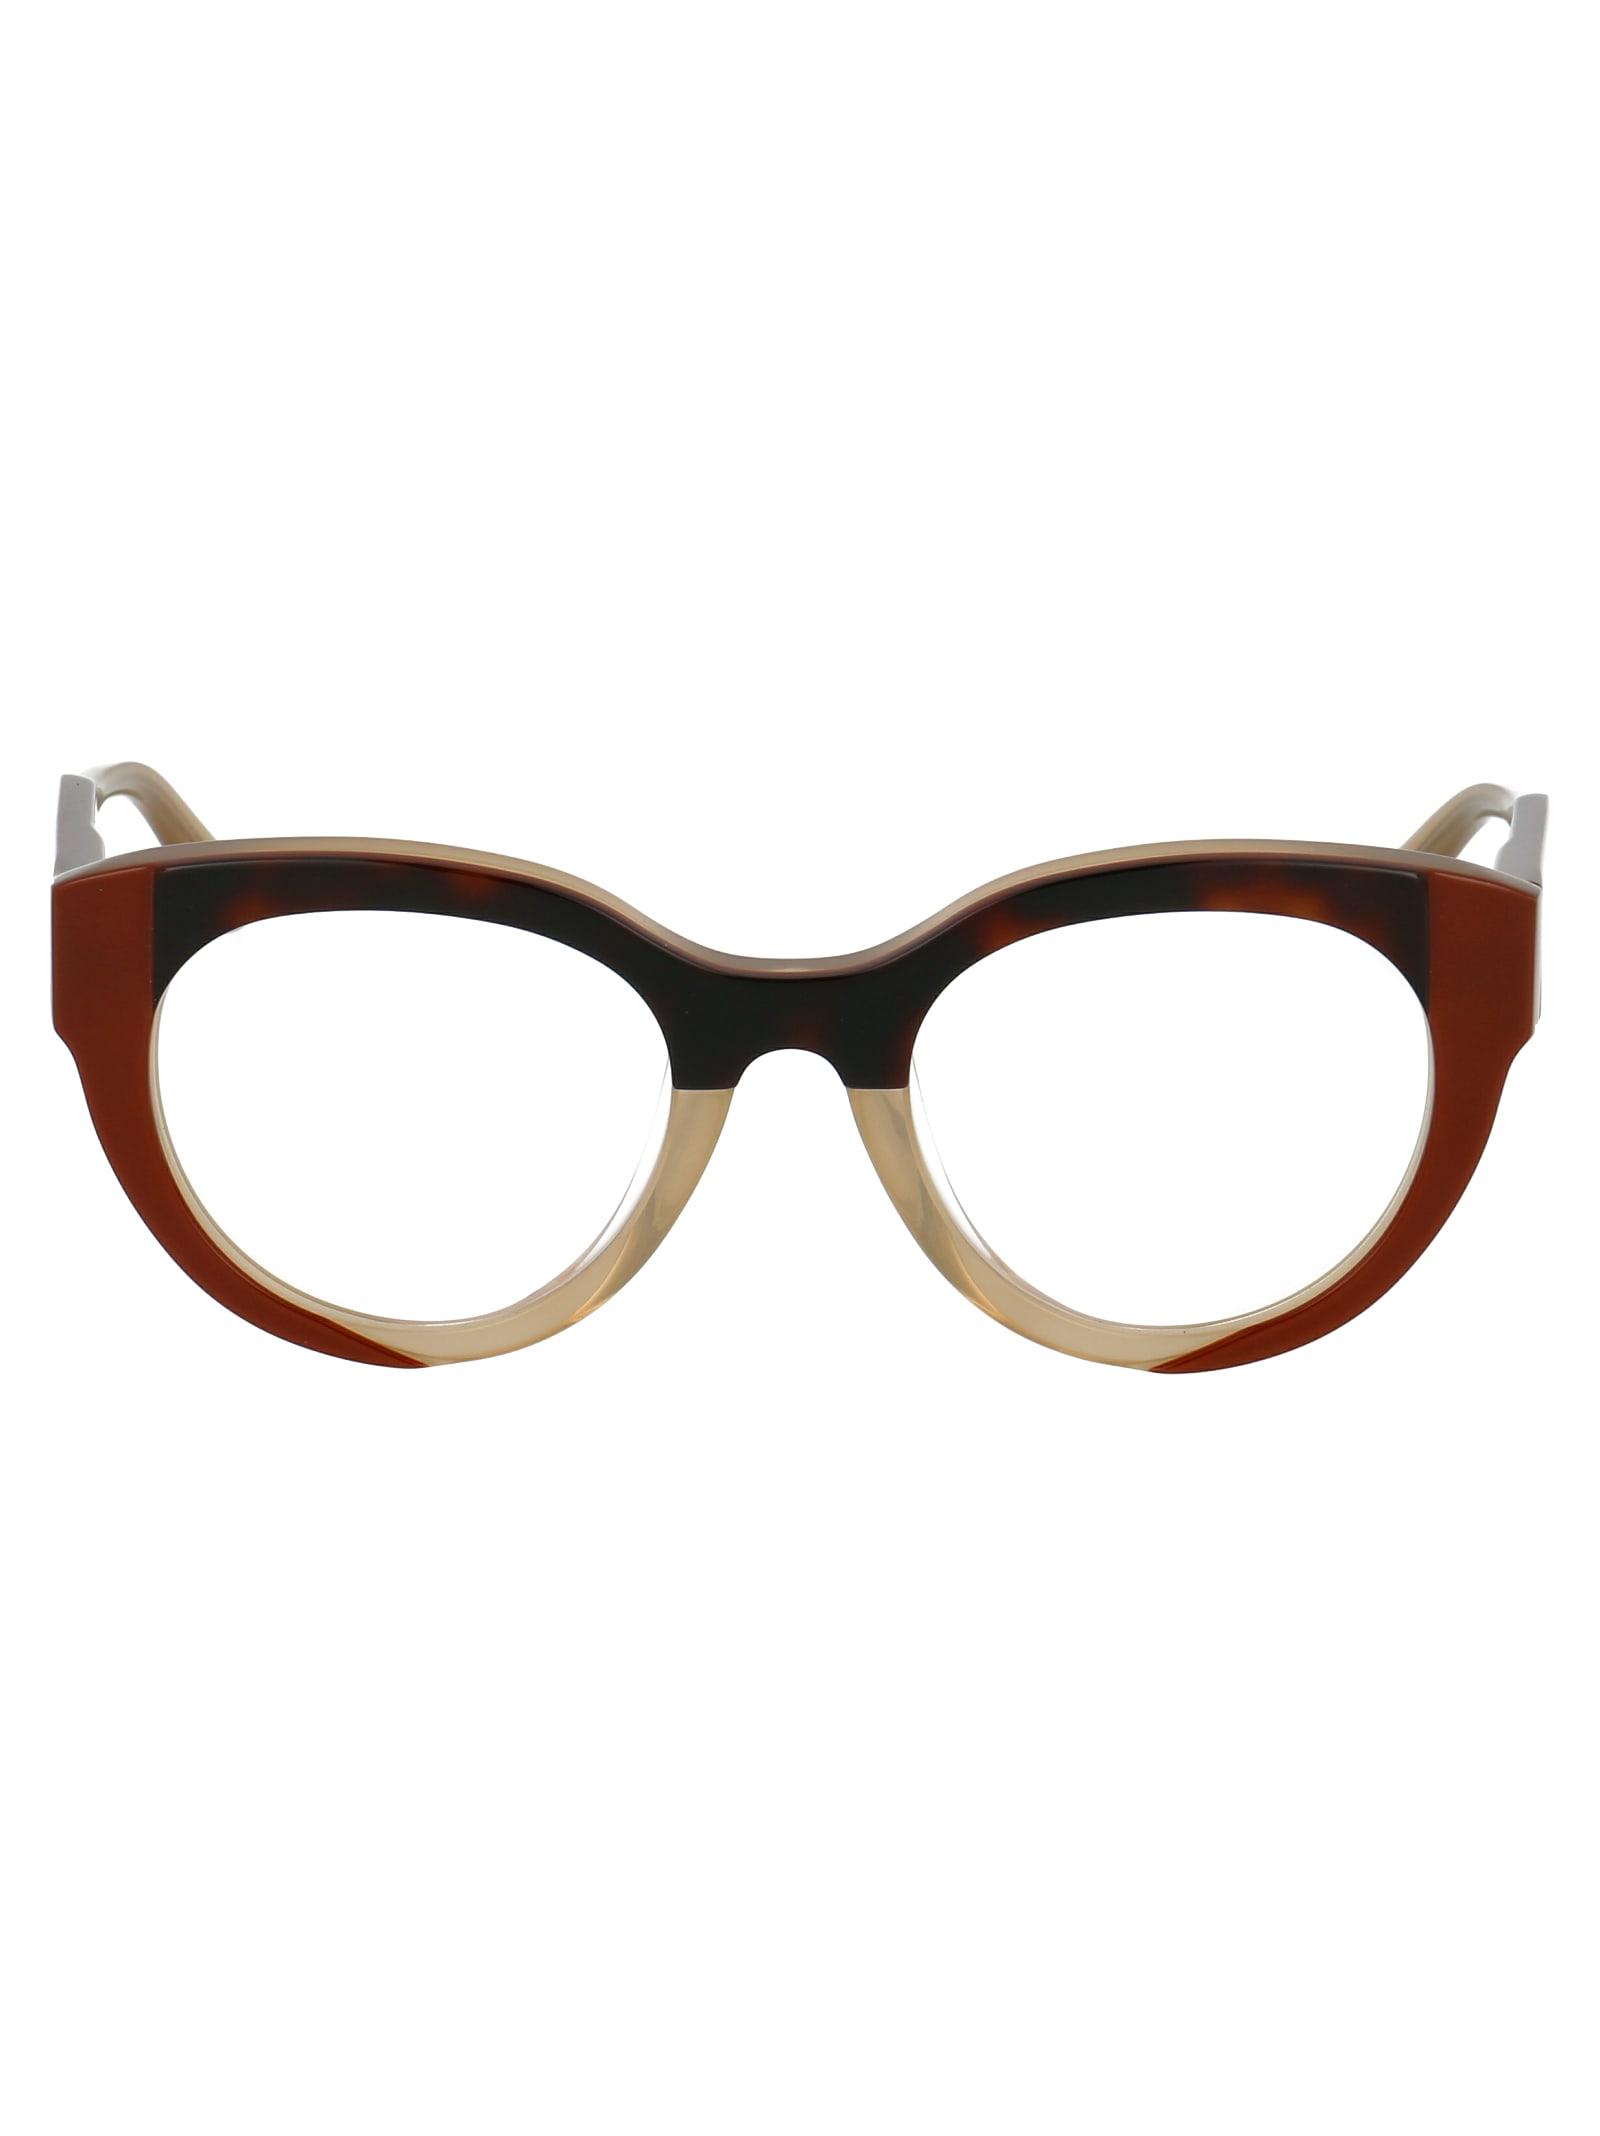 Me2604 Glasses